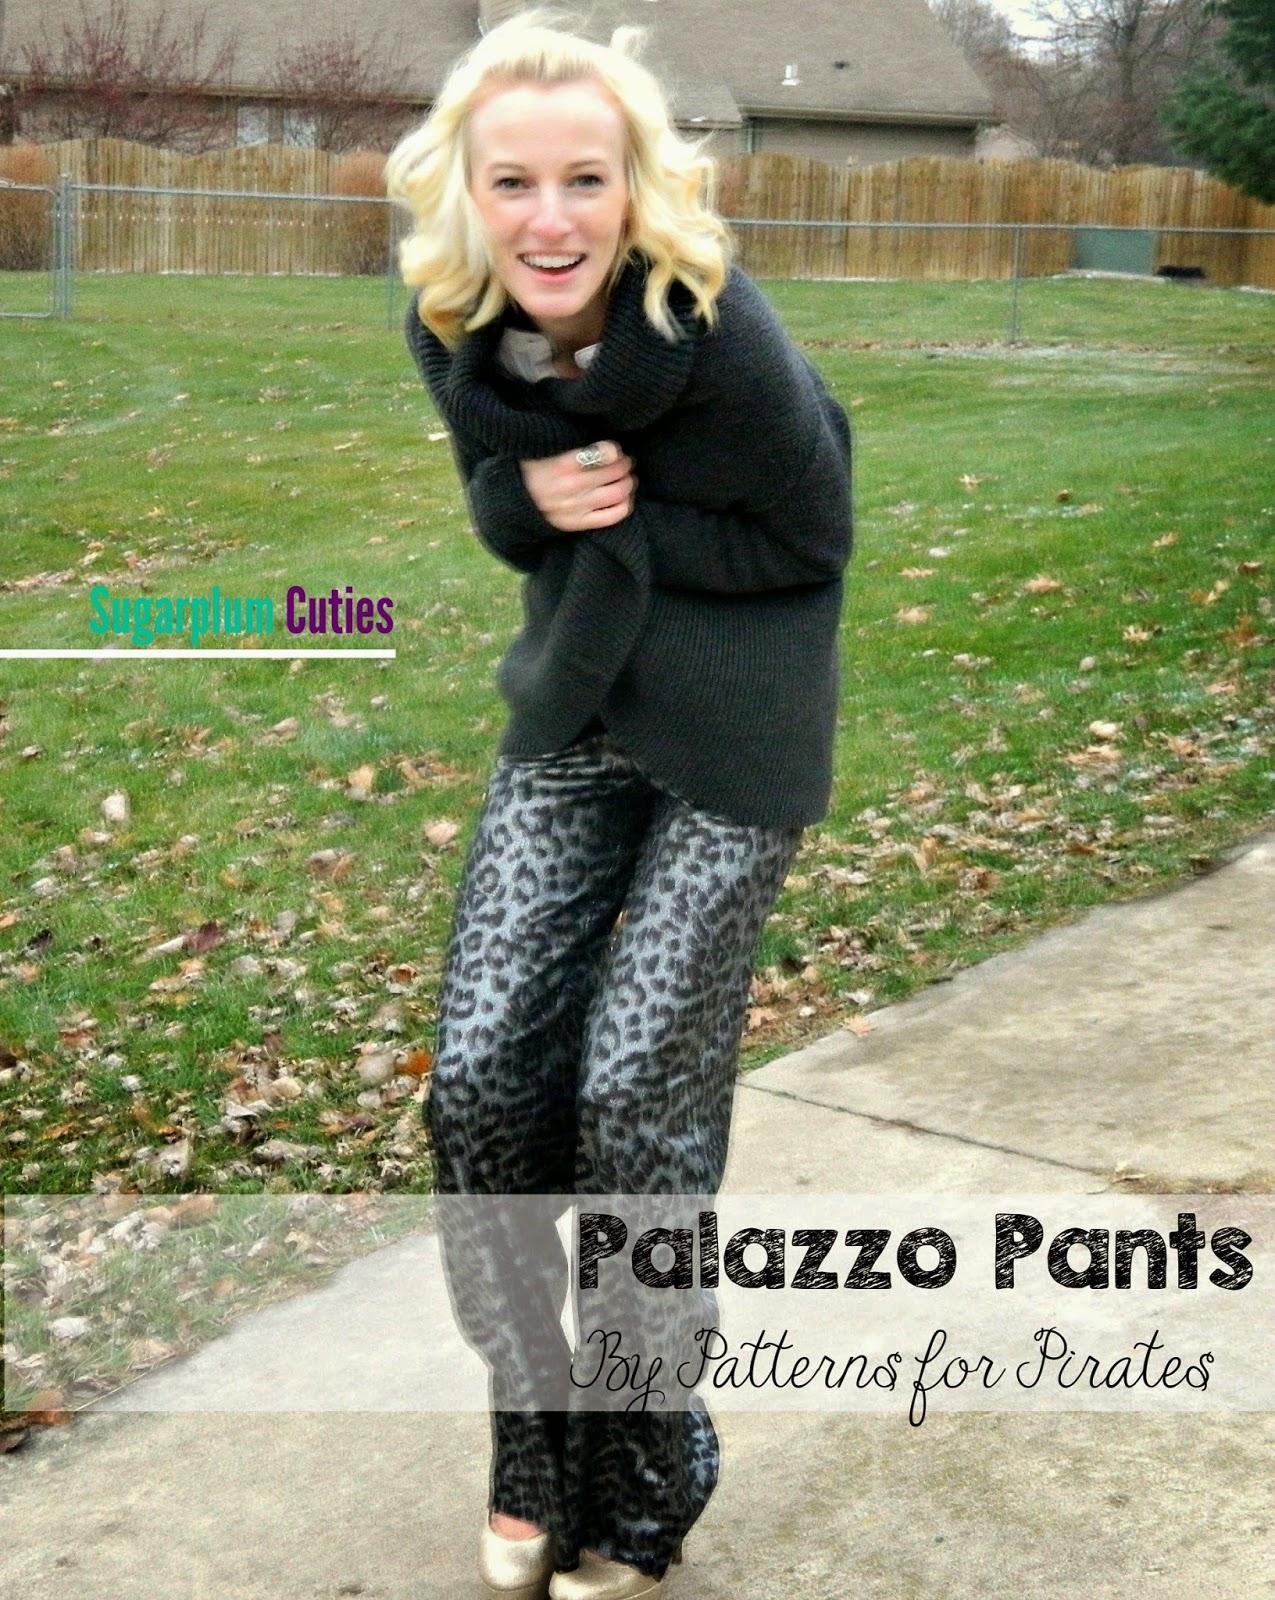 Sugarplum Cuties: Patterns for Pirates Palazzo Pants